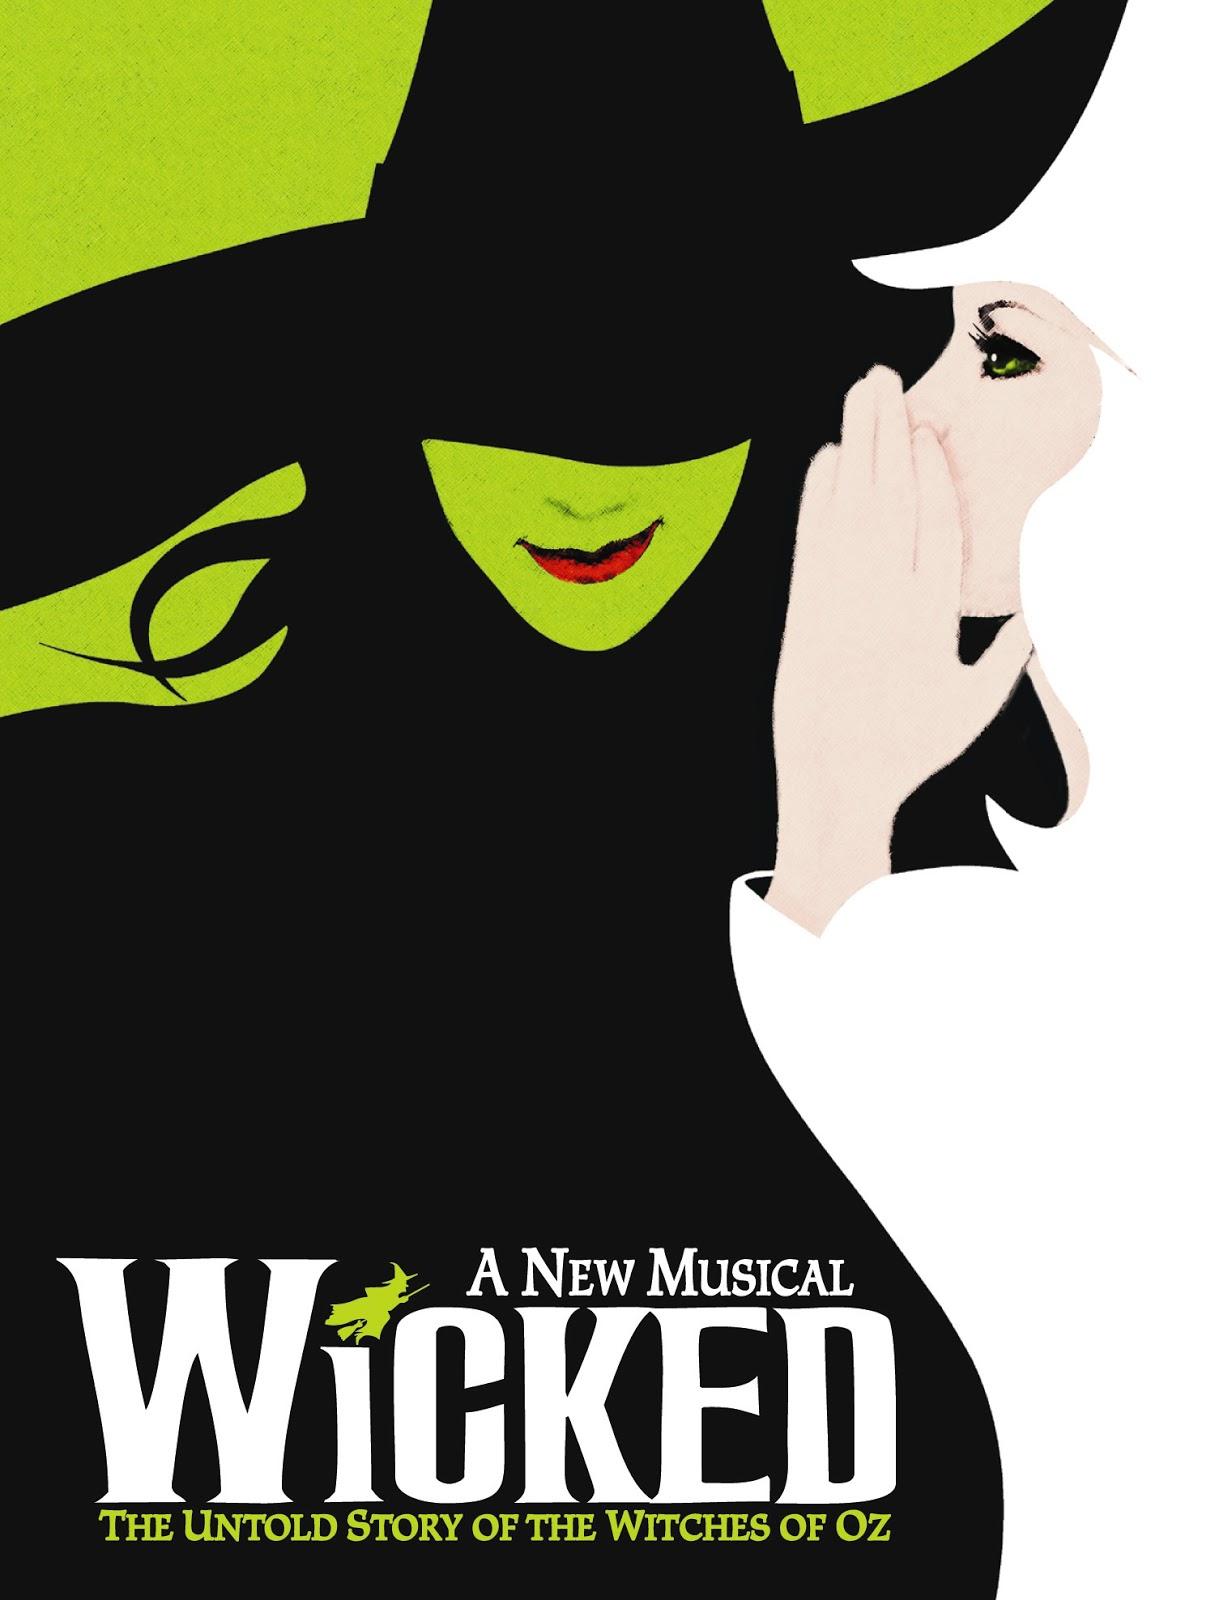 http://1.bp.blogspot.com/-MbNmwXFjJzg/TwfvI01GZ5I/AAAAAAAAE3E/PzFgSYFiyeU/s1600/Wicked-Broadway-Tour.jpg